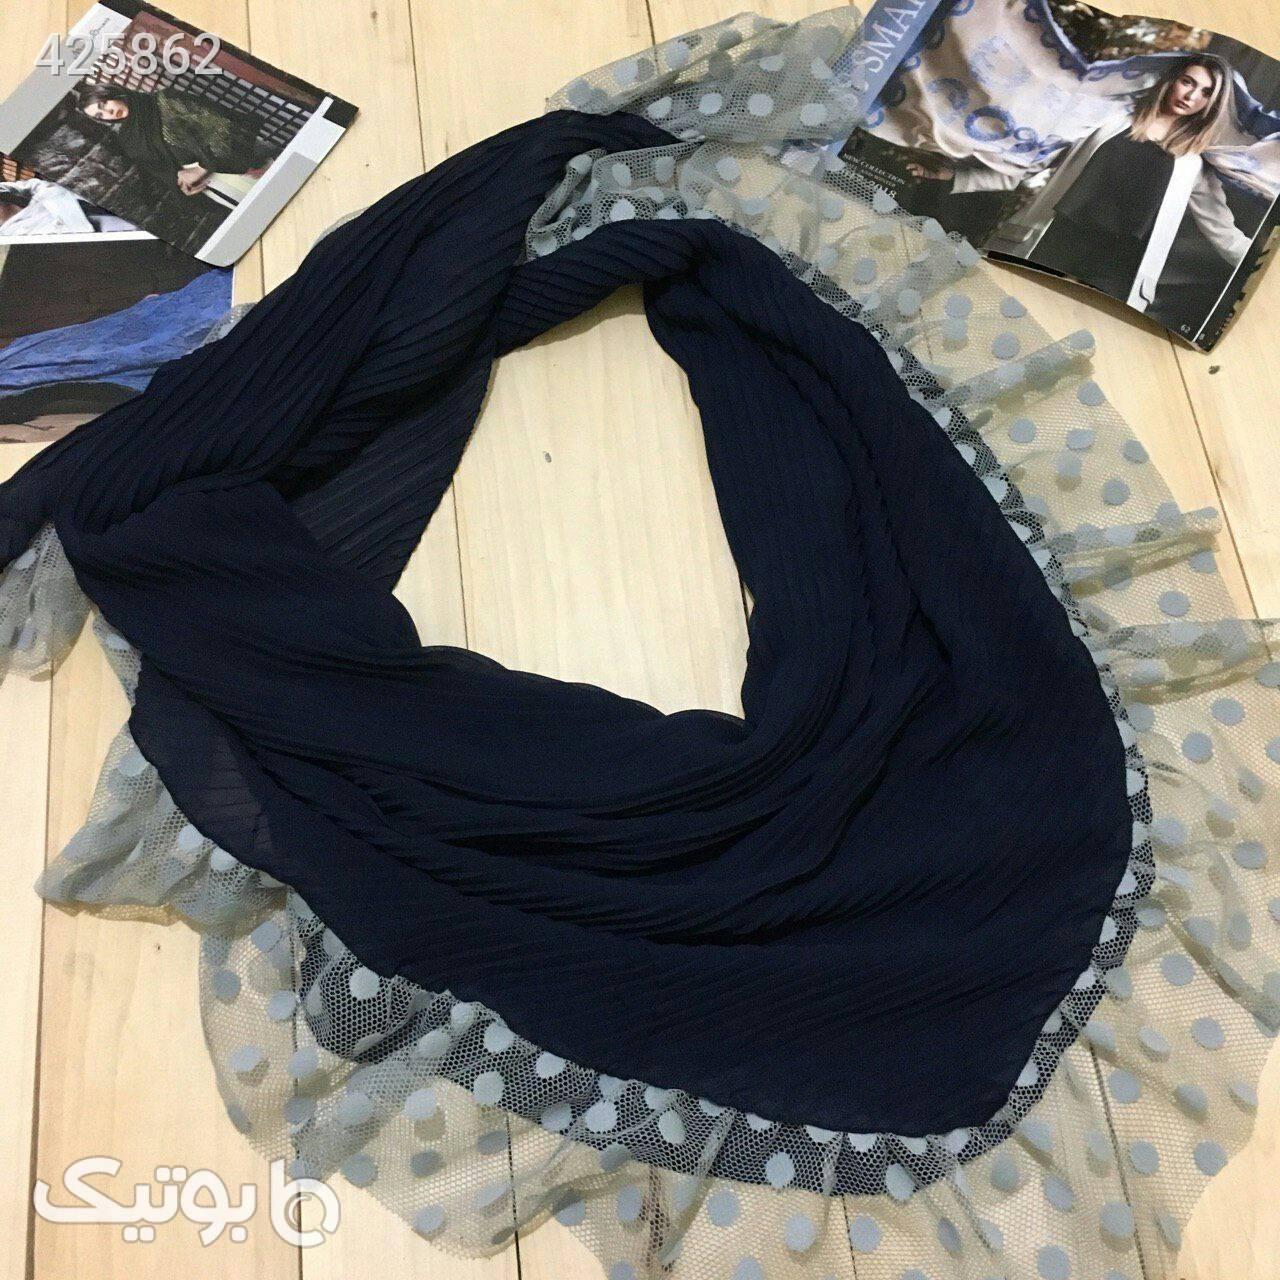 روسری مشکی شال و روسری